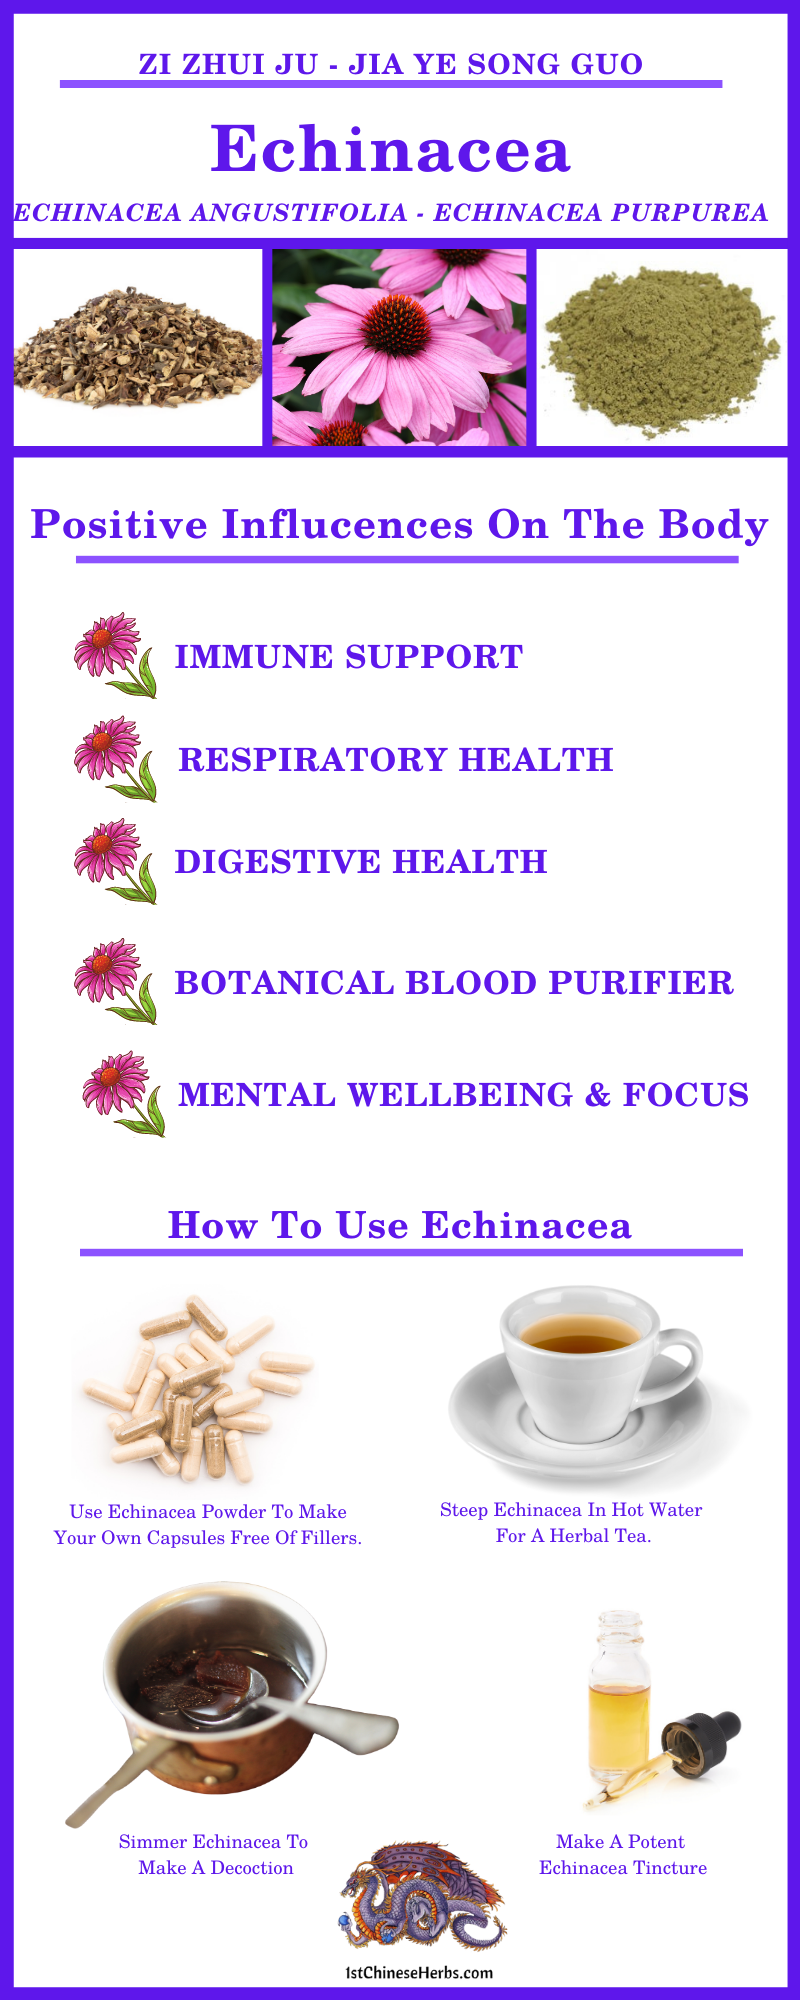 echinacea flu, echinacea respiratory infection, echinacea colds, echinacea respiratory health, echinacea immune booster